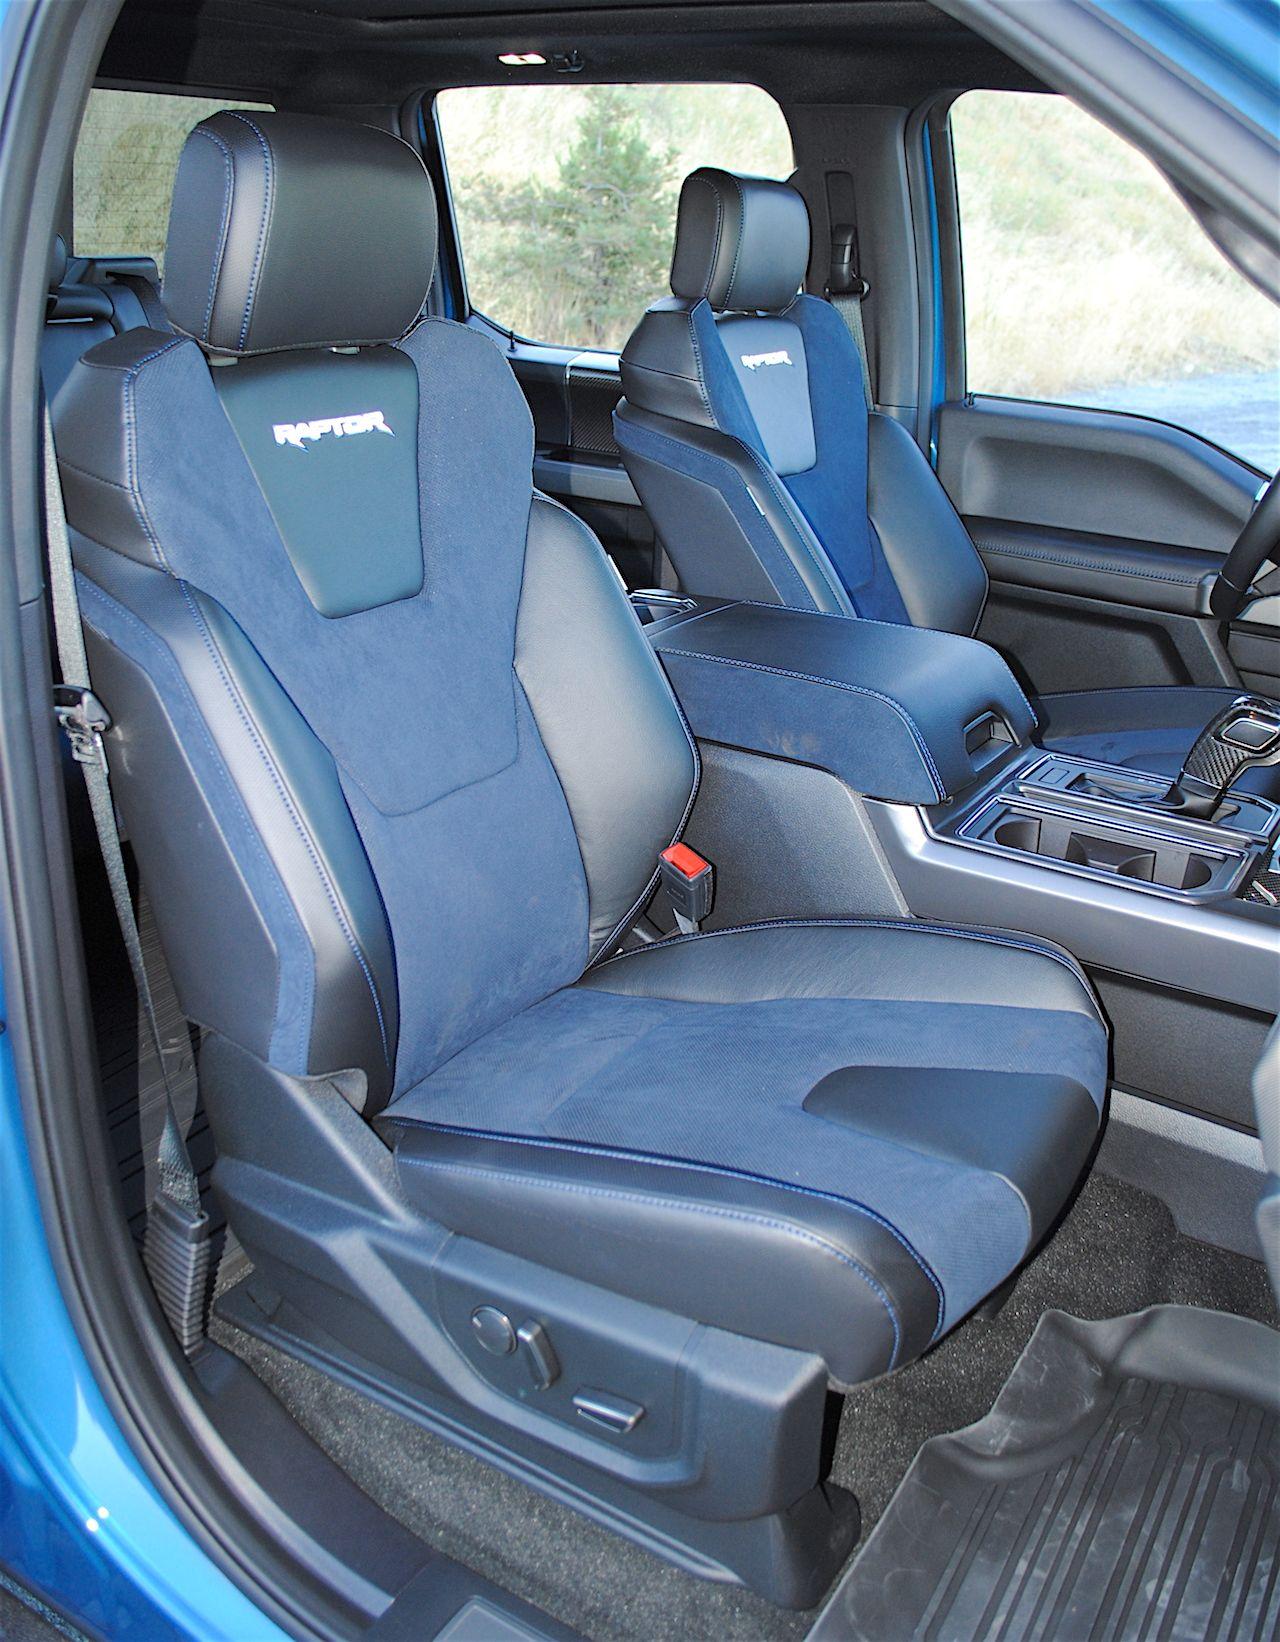 Velocity Blue F150 : velocity, F-150, Raptor., Choose, Velocity, Interior, Ford,, Raptor, Truck,